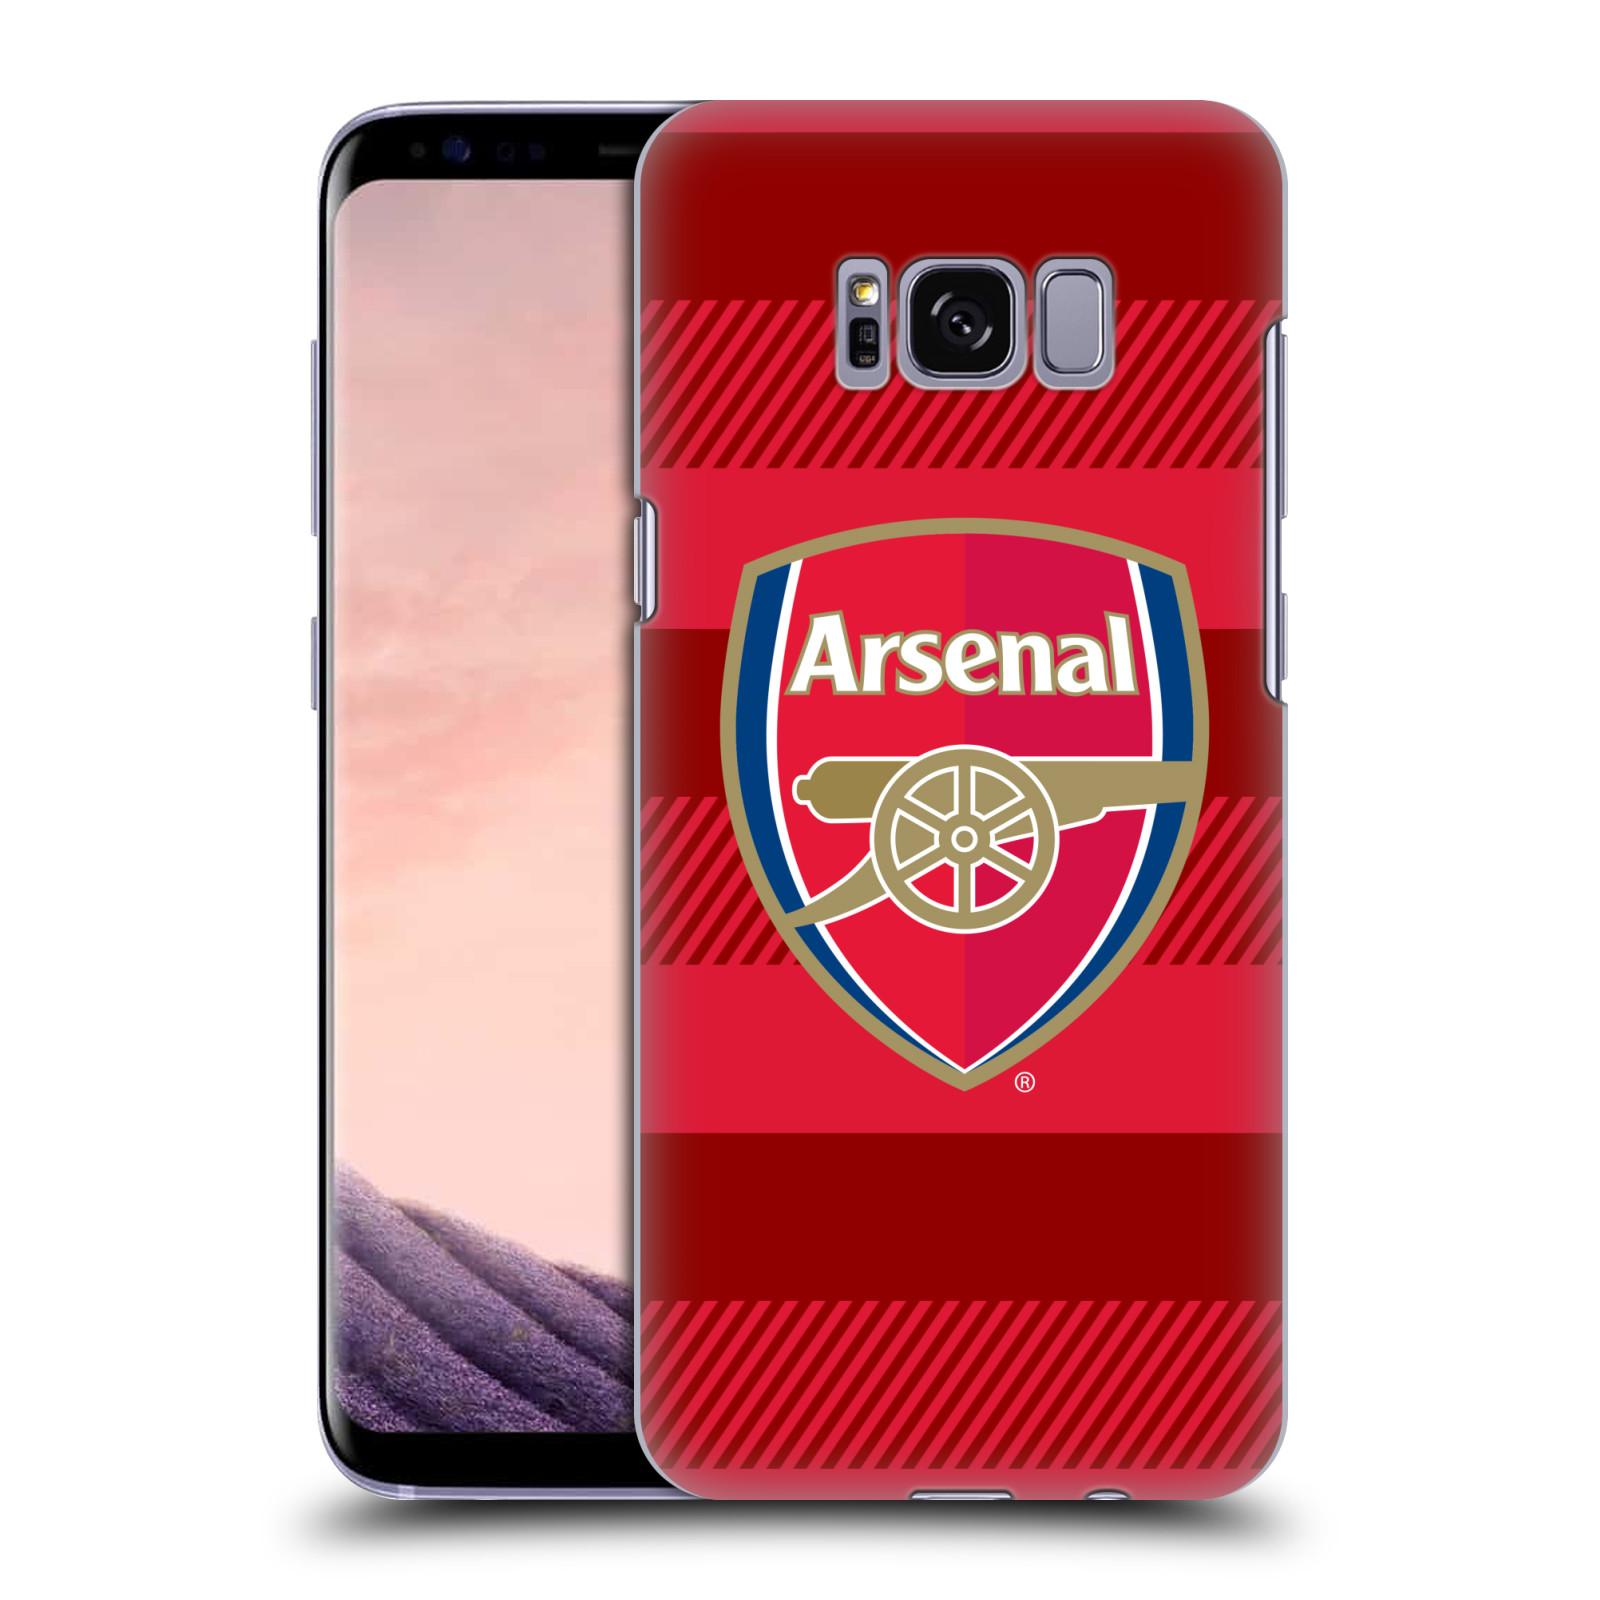 Plastové pouzdro na mobil Samsung Galaxy S8 - Head Case - Arsenal FC - Logo s pruhy